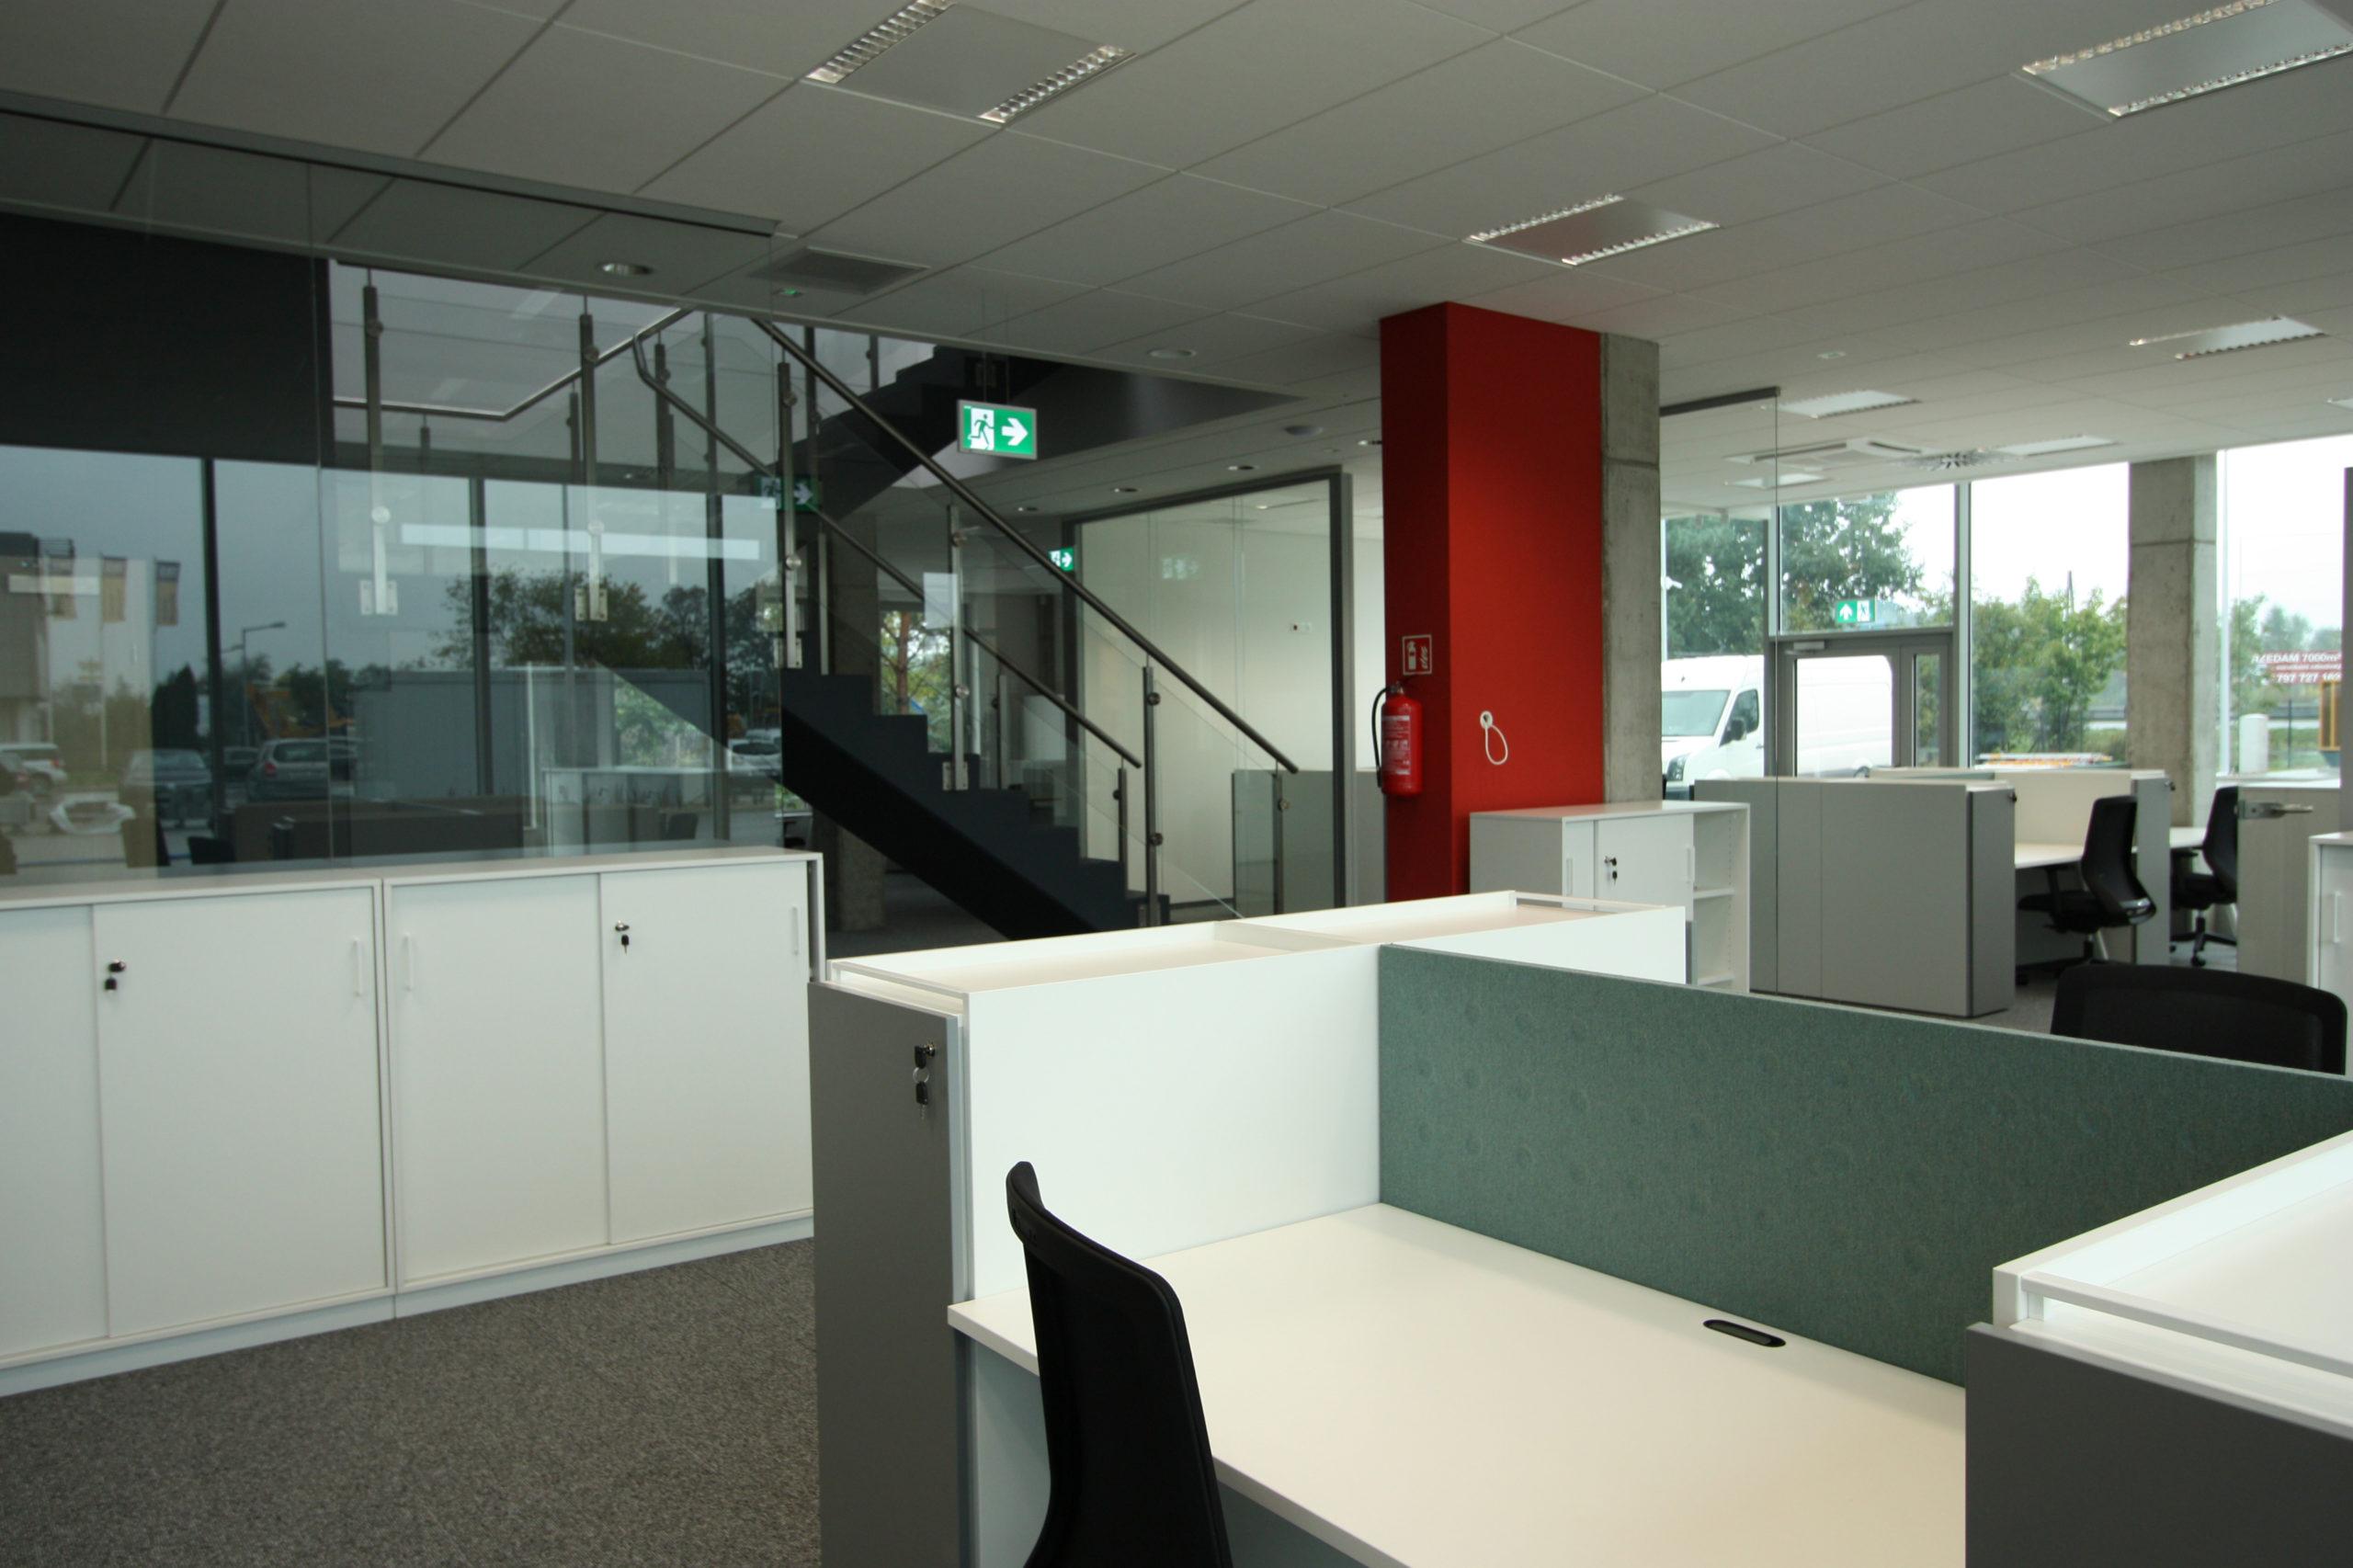 bergerat monnoyeur, budynek biurowo-serwisowy, wnetrze, caterpillar, biura, architektura